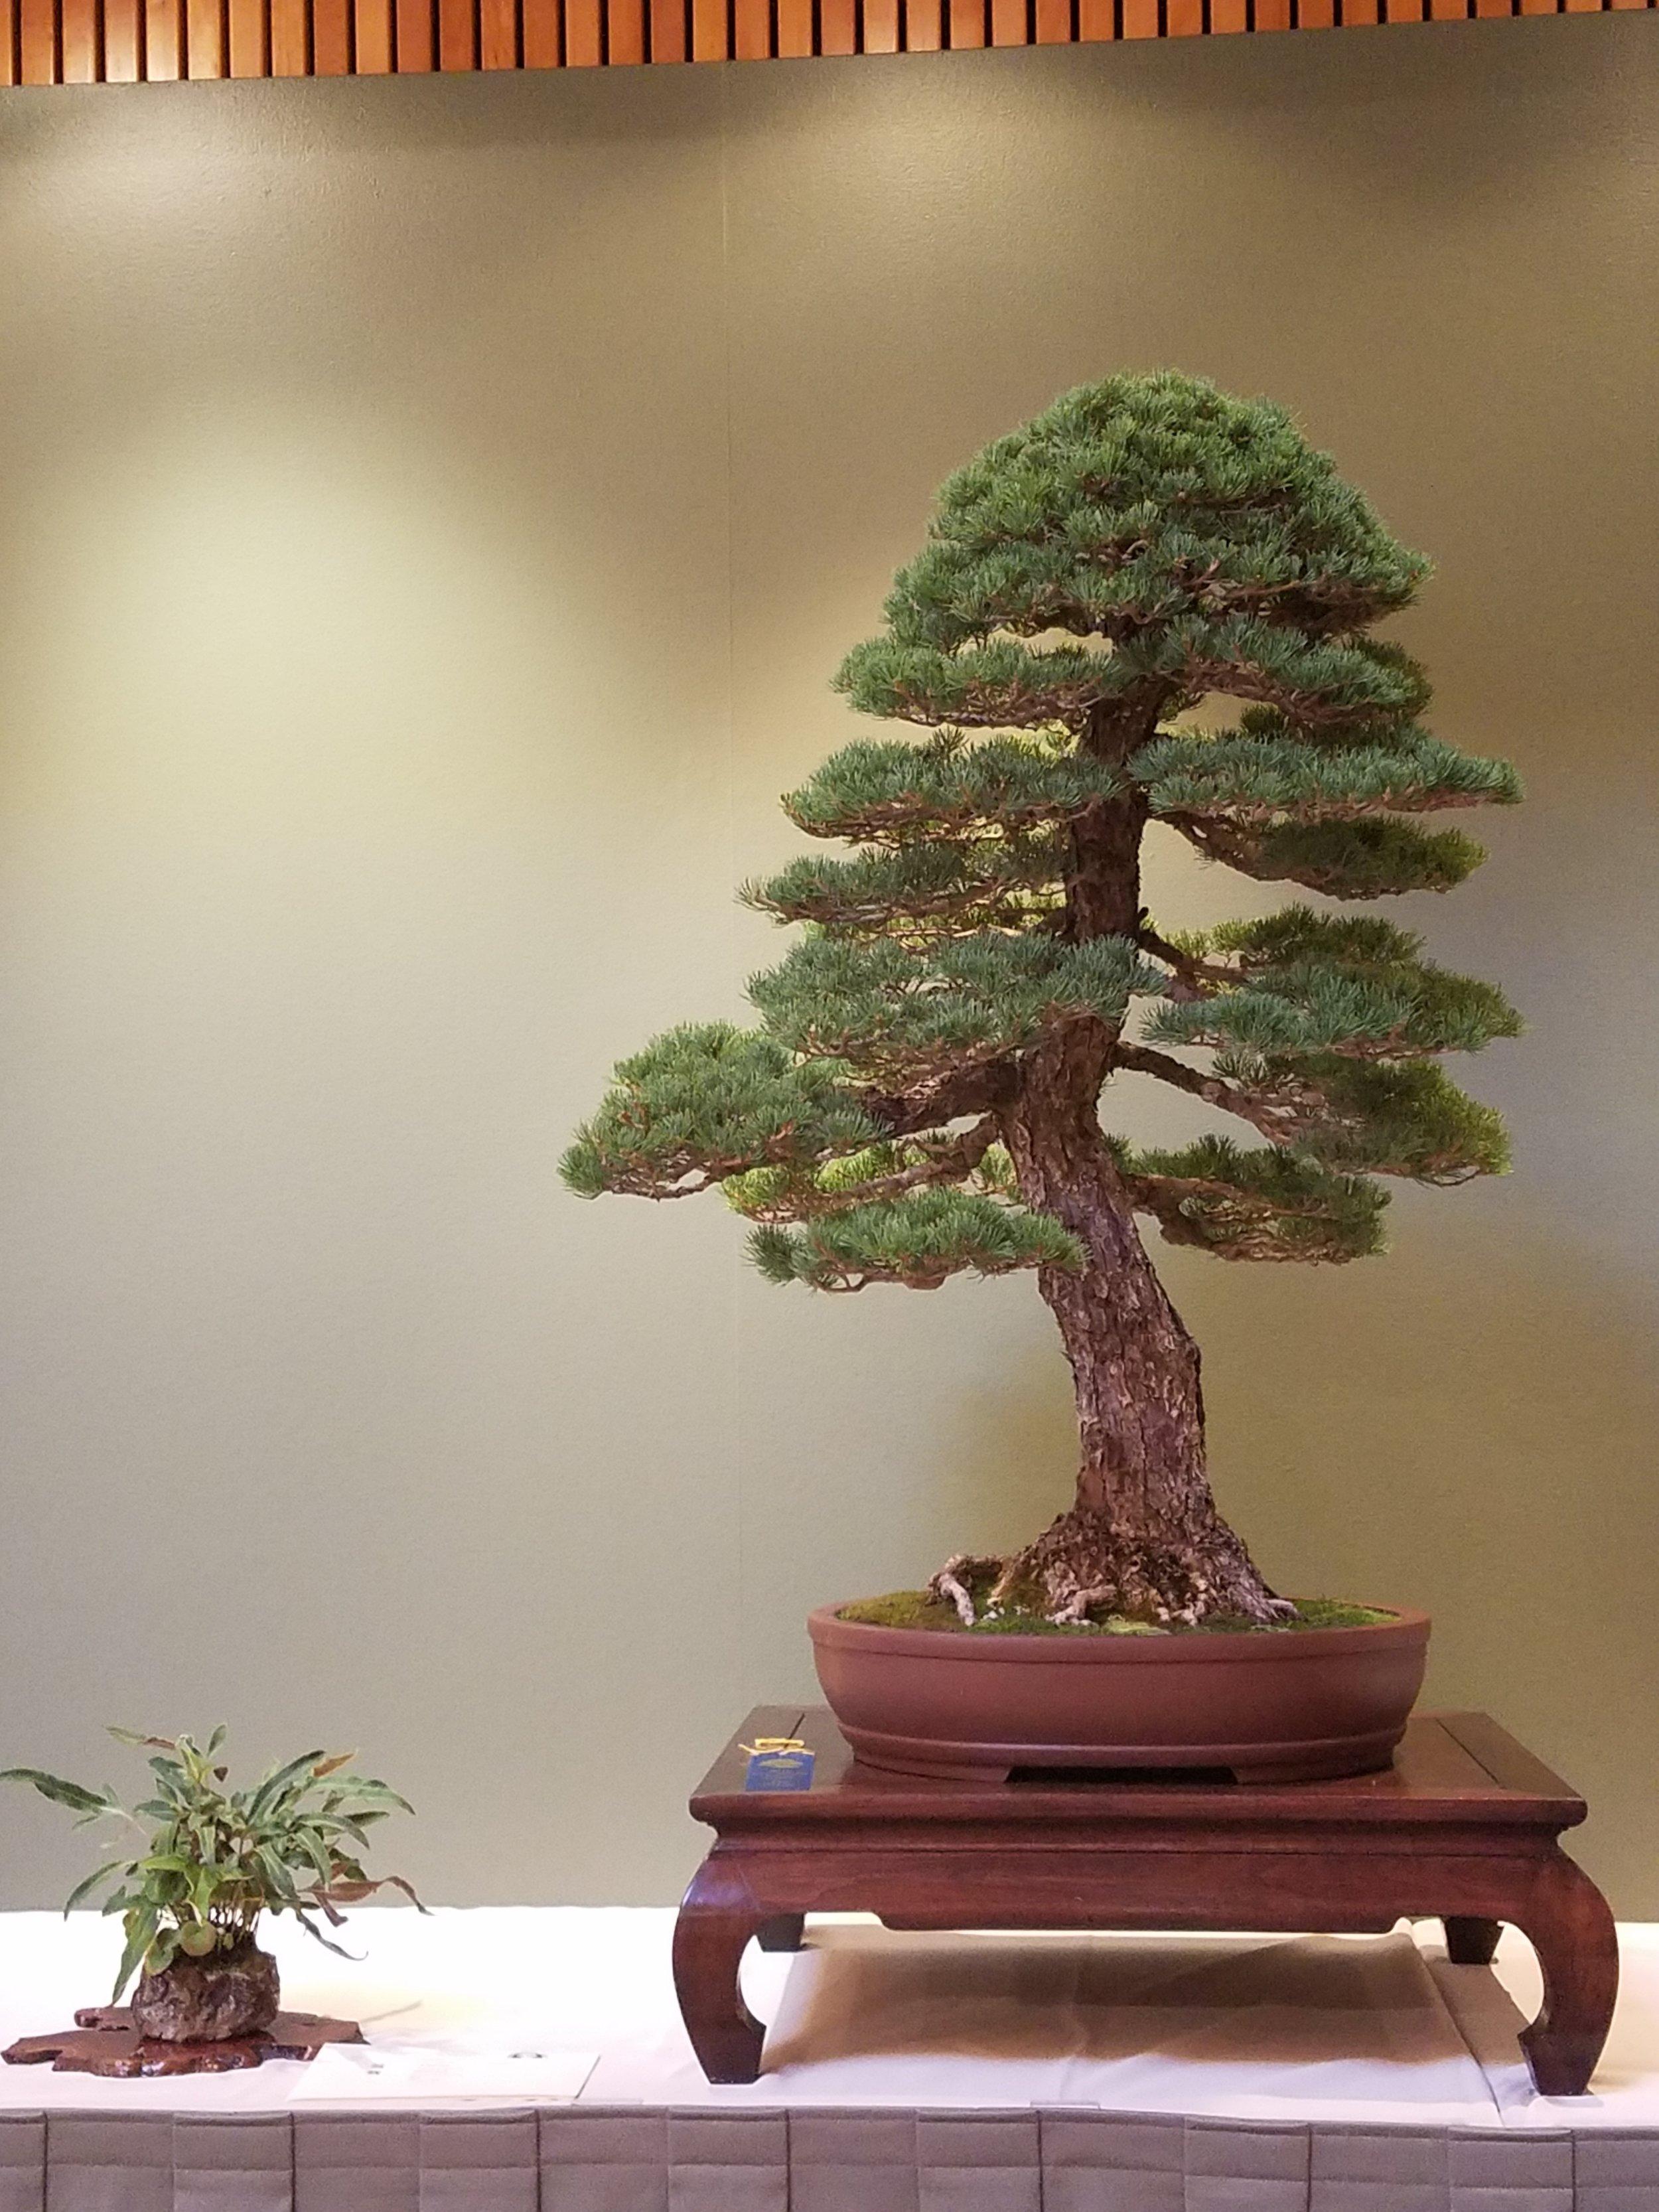 2017 Mid-America Bonsai Exhibition - Japanese Five Needle Pine - Informal Upright